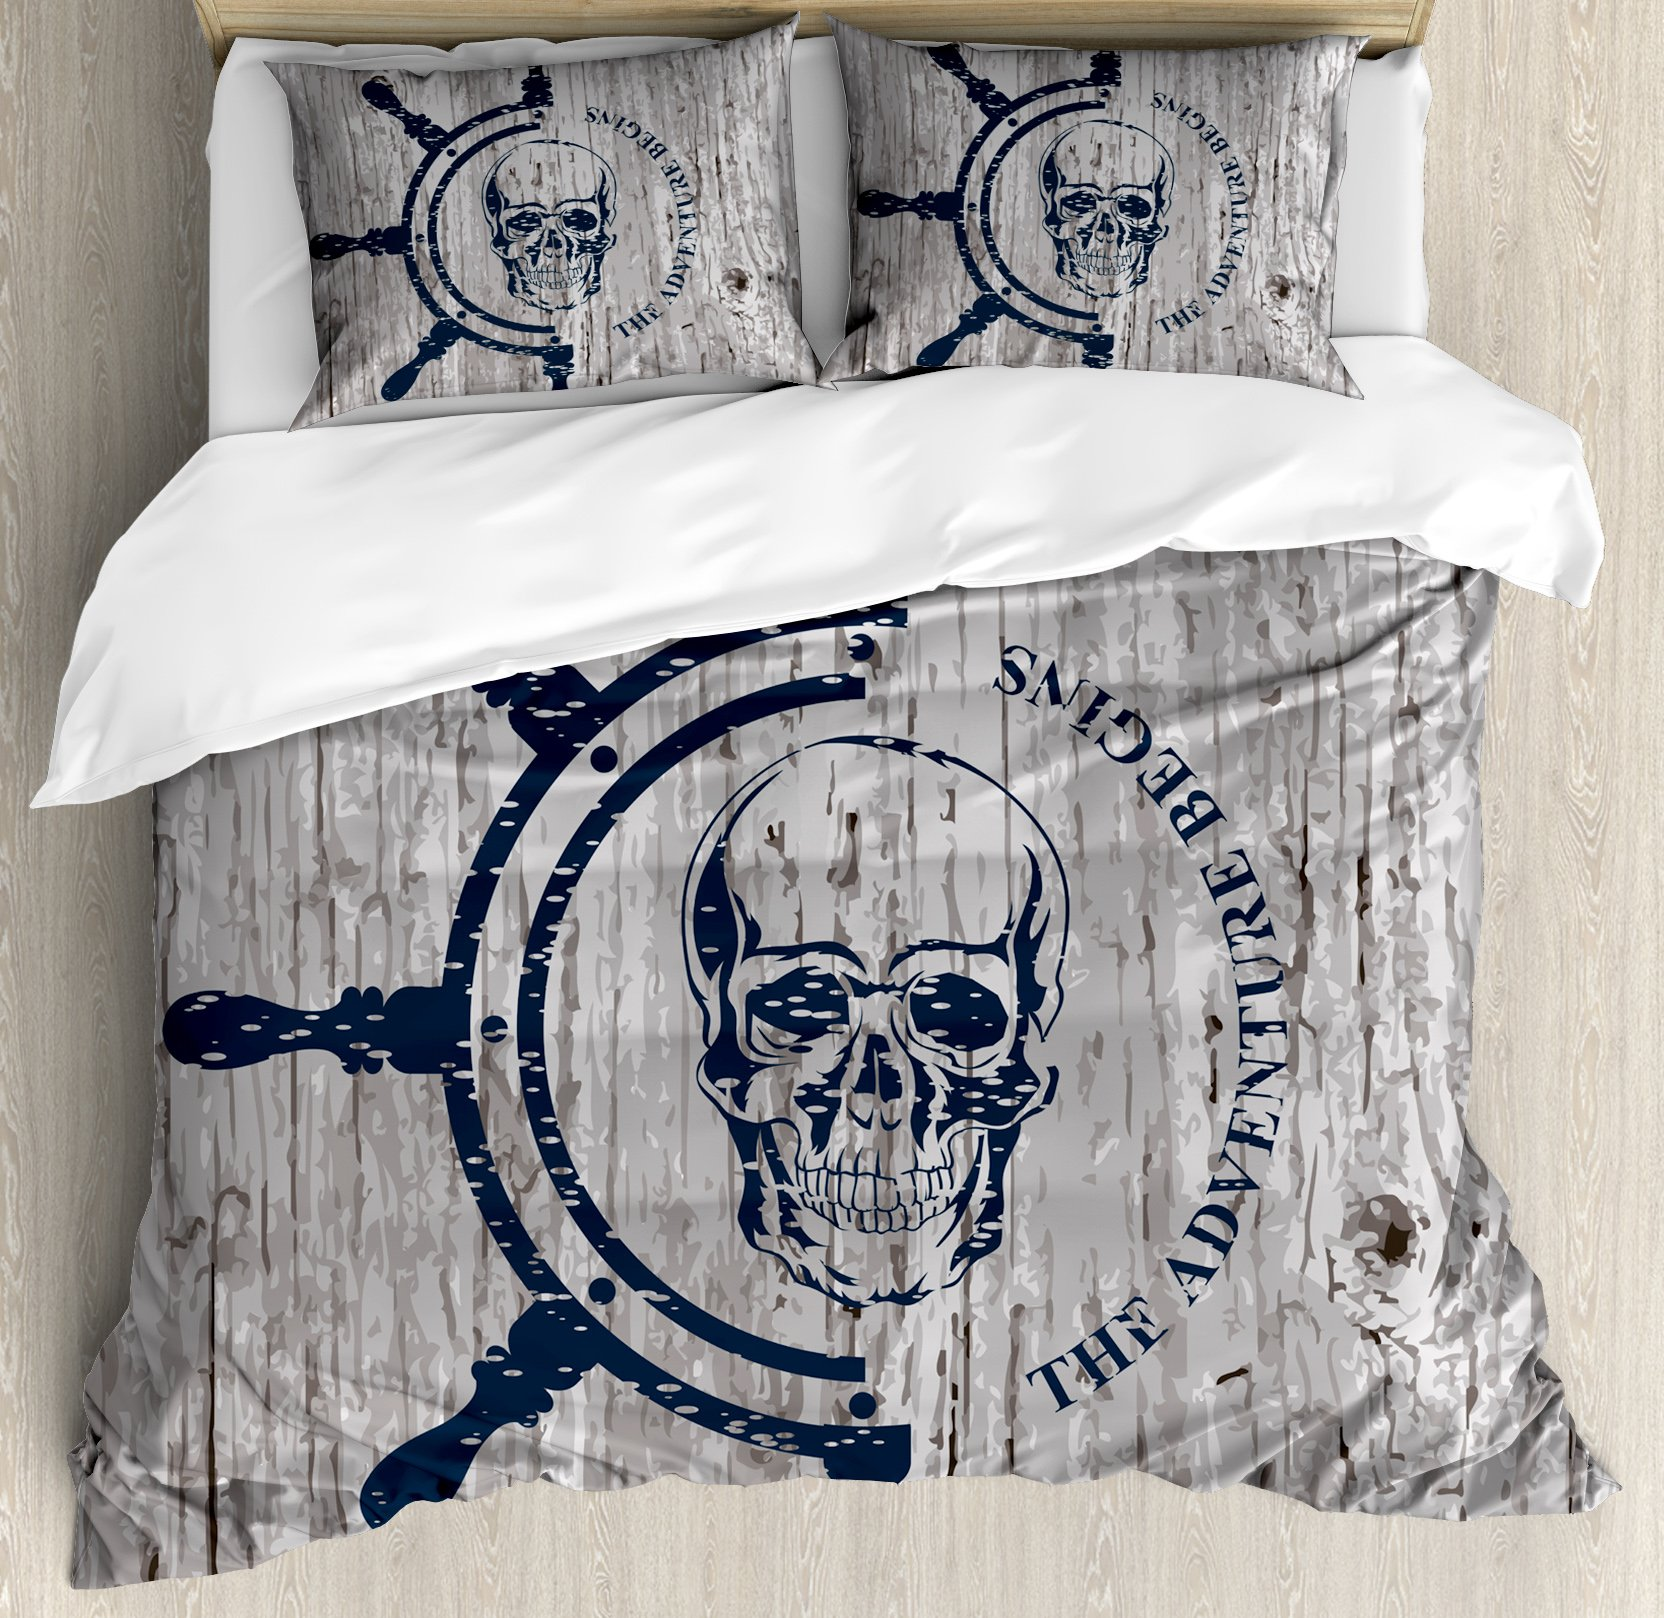 Nautical Duvet Cover Set King Size by Lunarable, Marine Theme Digital Image Skull Helm Ocean Inspired Image Vintage Pattern, Decorative 3 Piece Bedding Set with 2 Pillow Shams, Dark Blue Grey